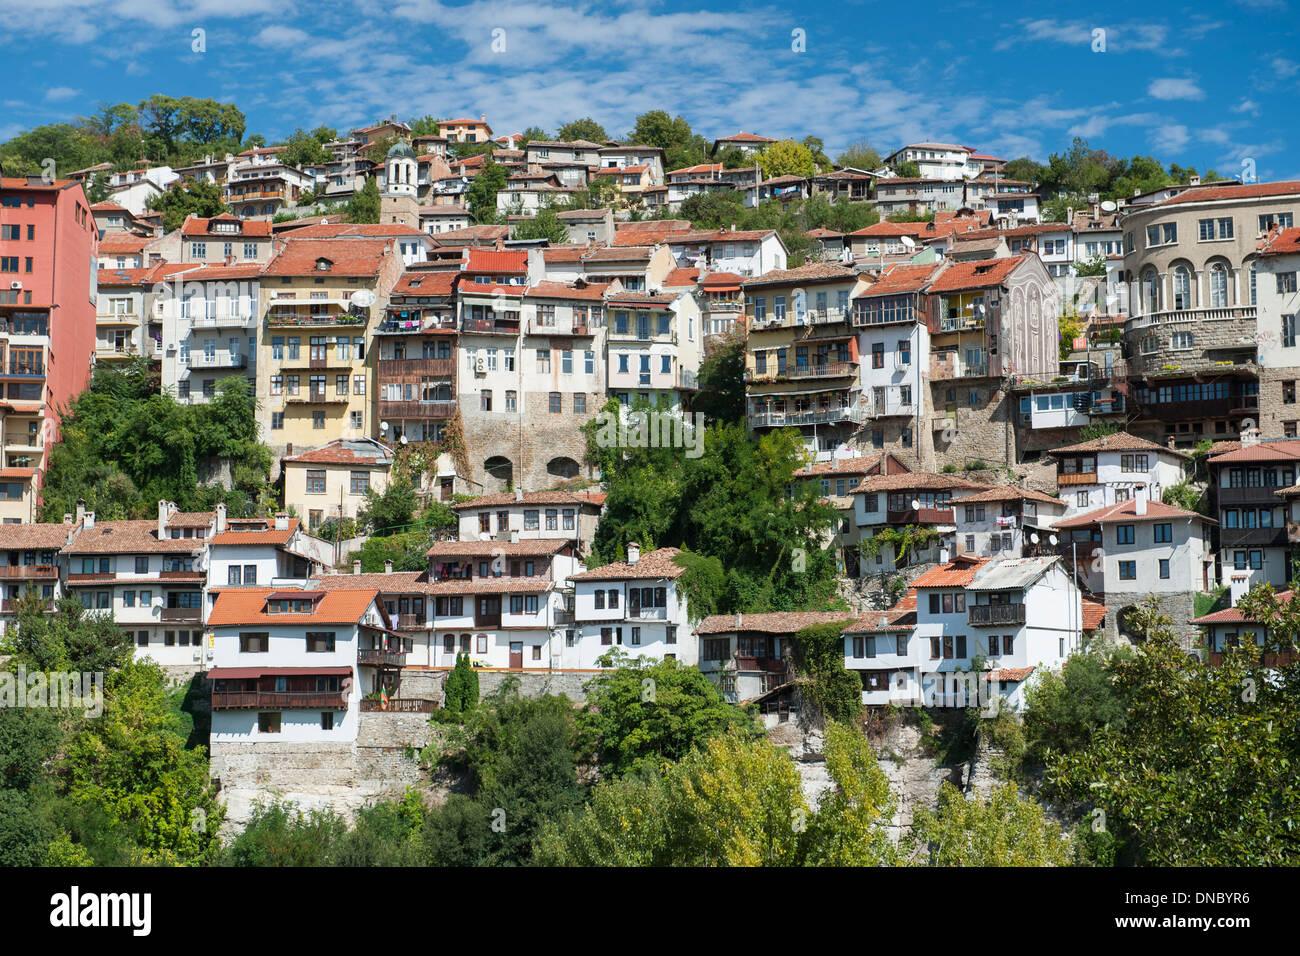 Houses on the hills of Veliko Tarnovo in Bulgaria. Stock Photo